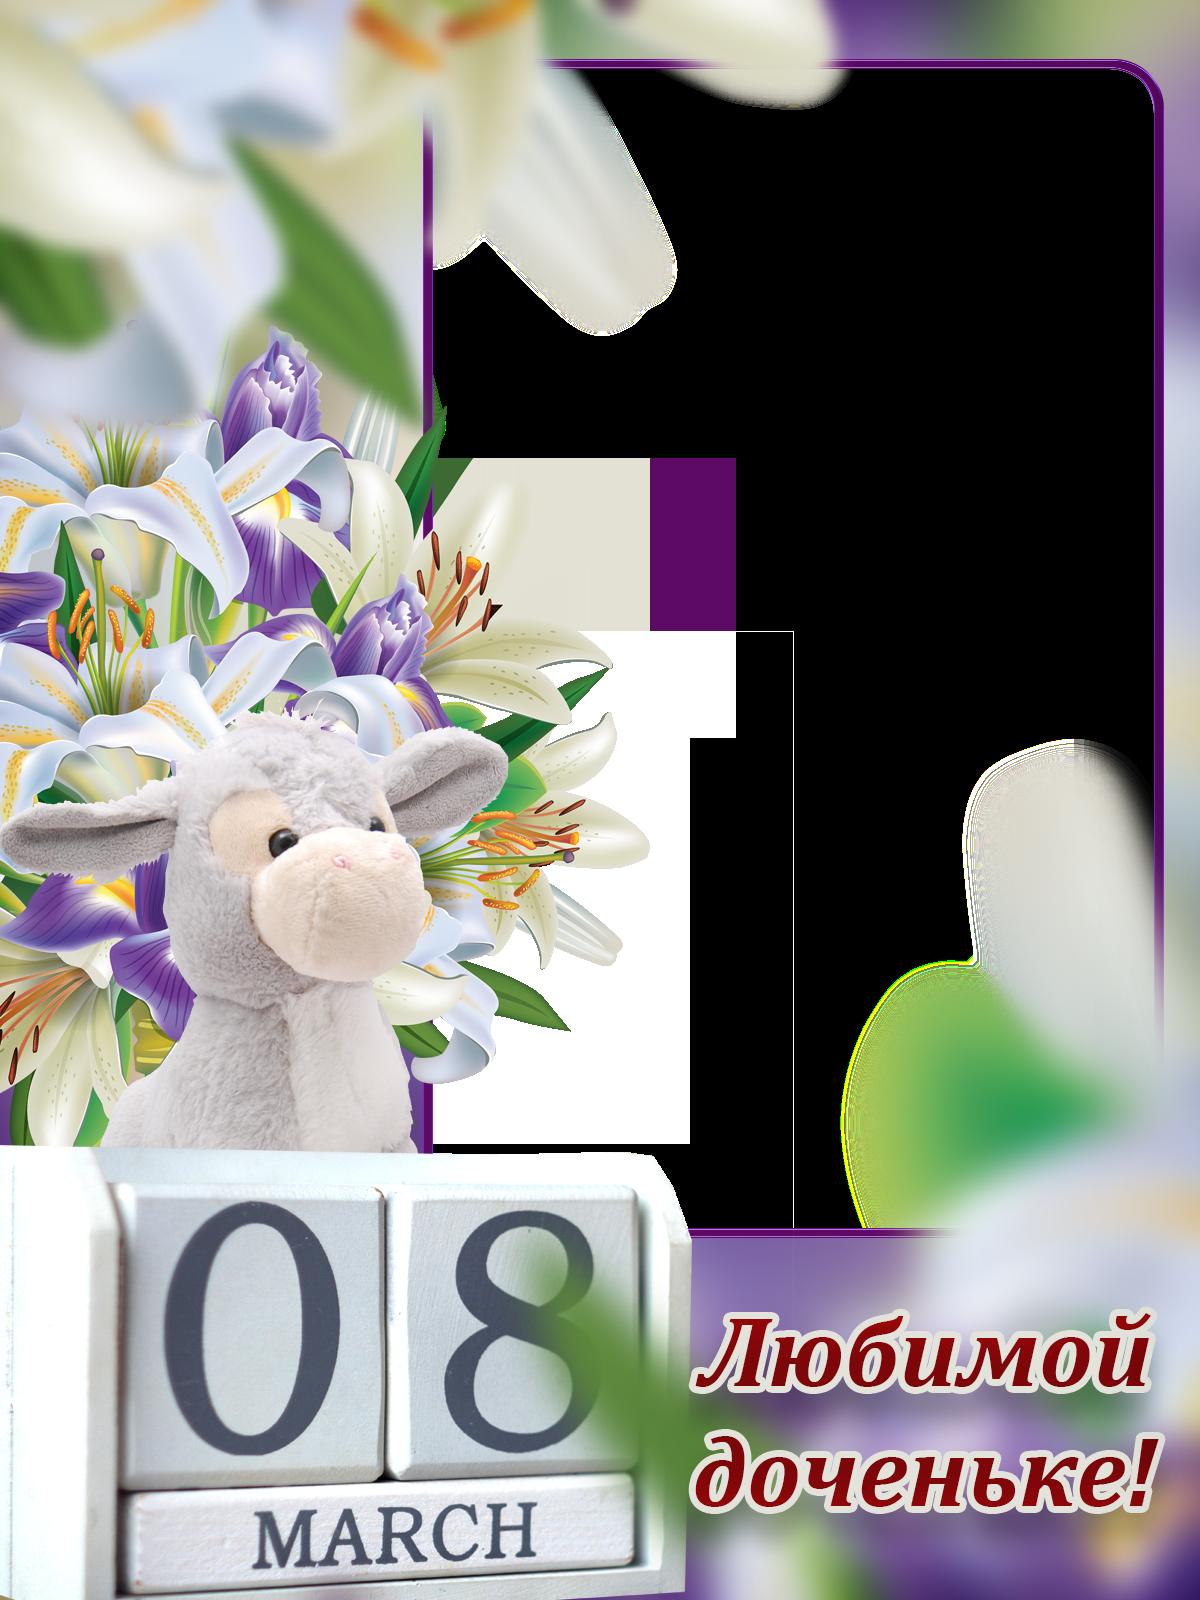 Фоторамка Любимой доченьке Фоторамка для фотошопа, PNG шаблон. Открытка, фоторамка на 8 Марта